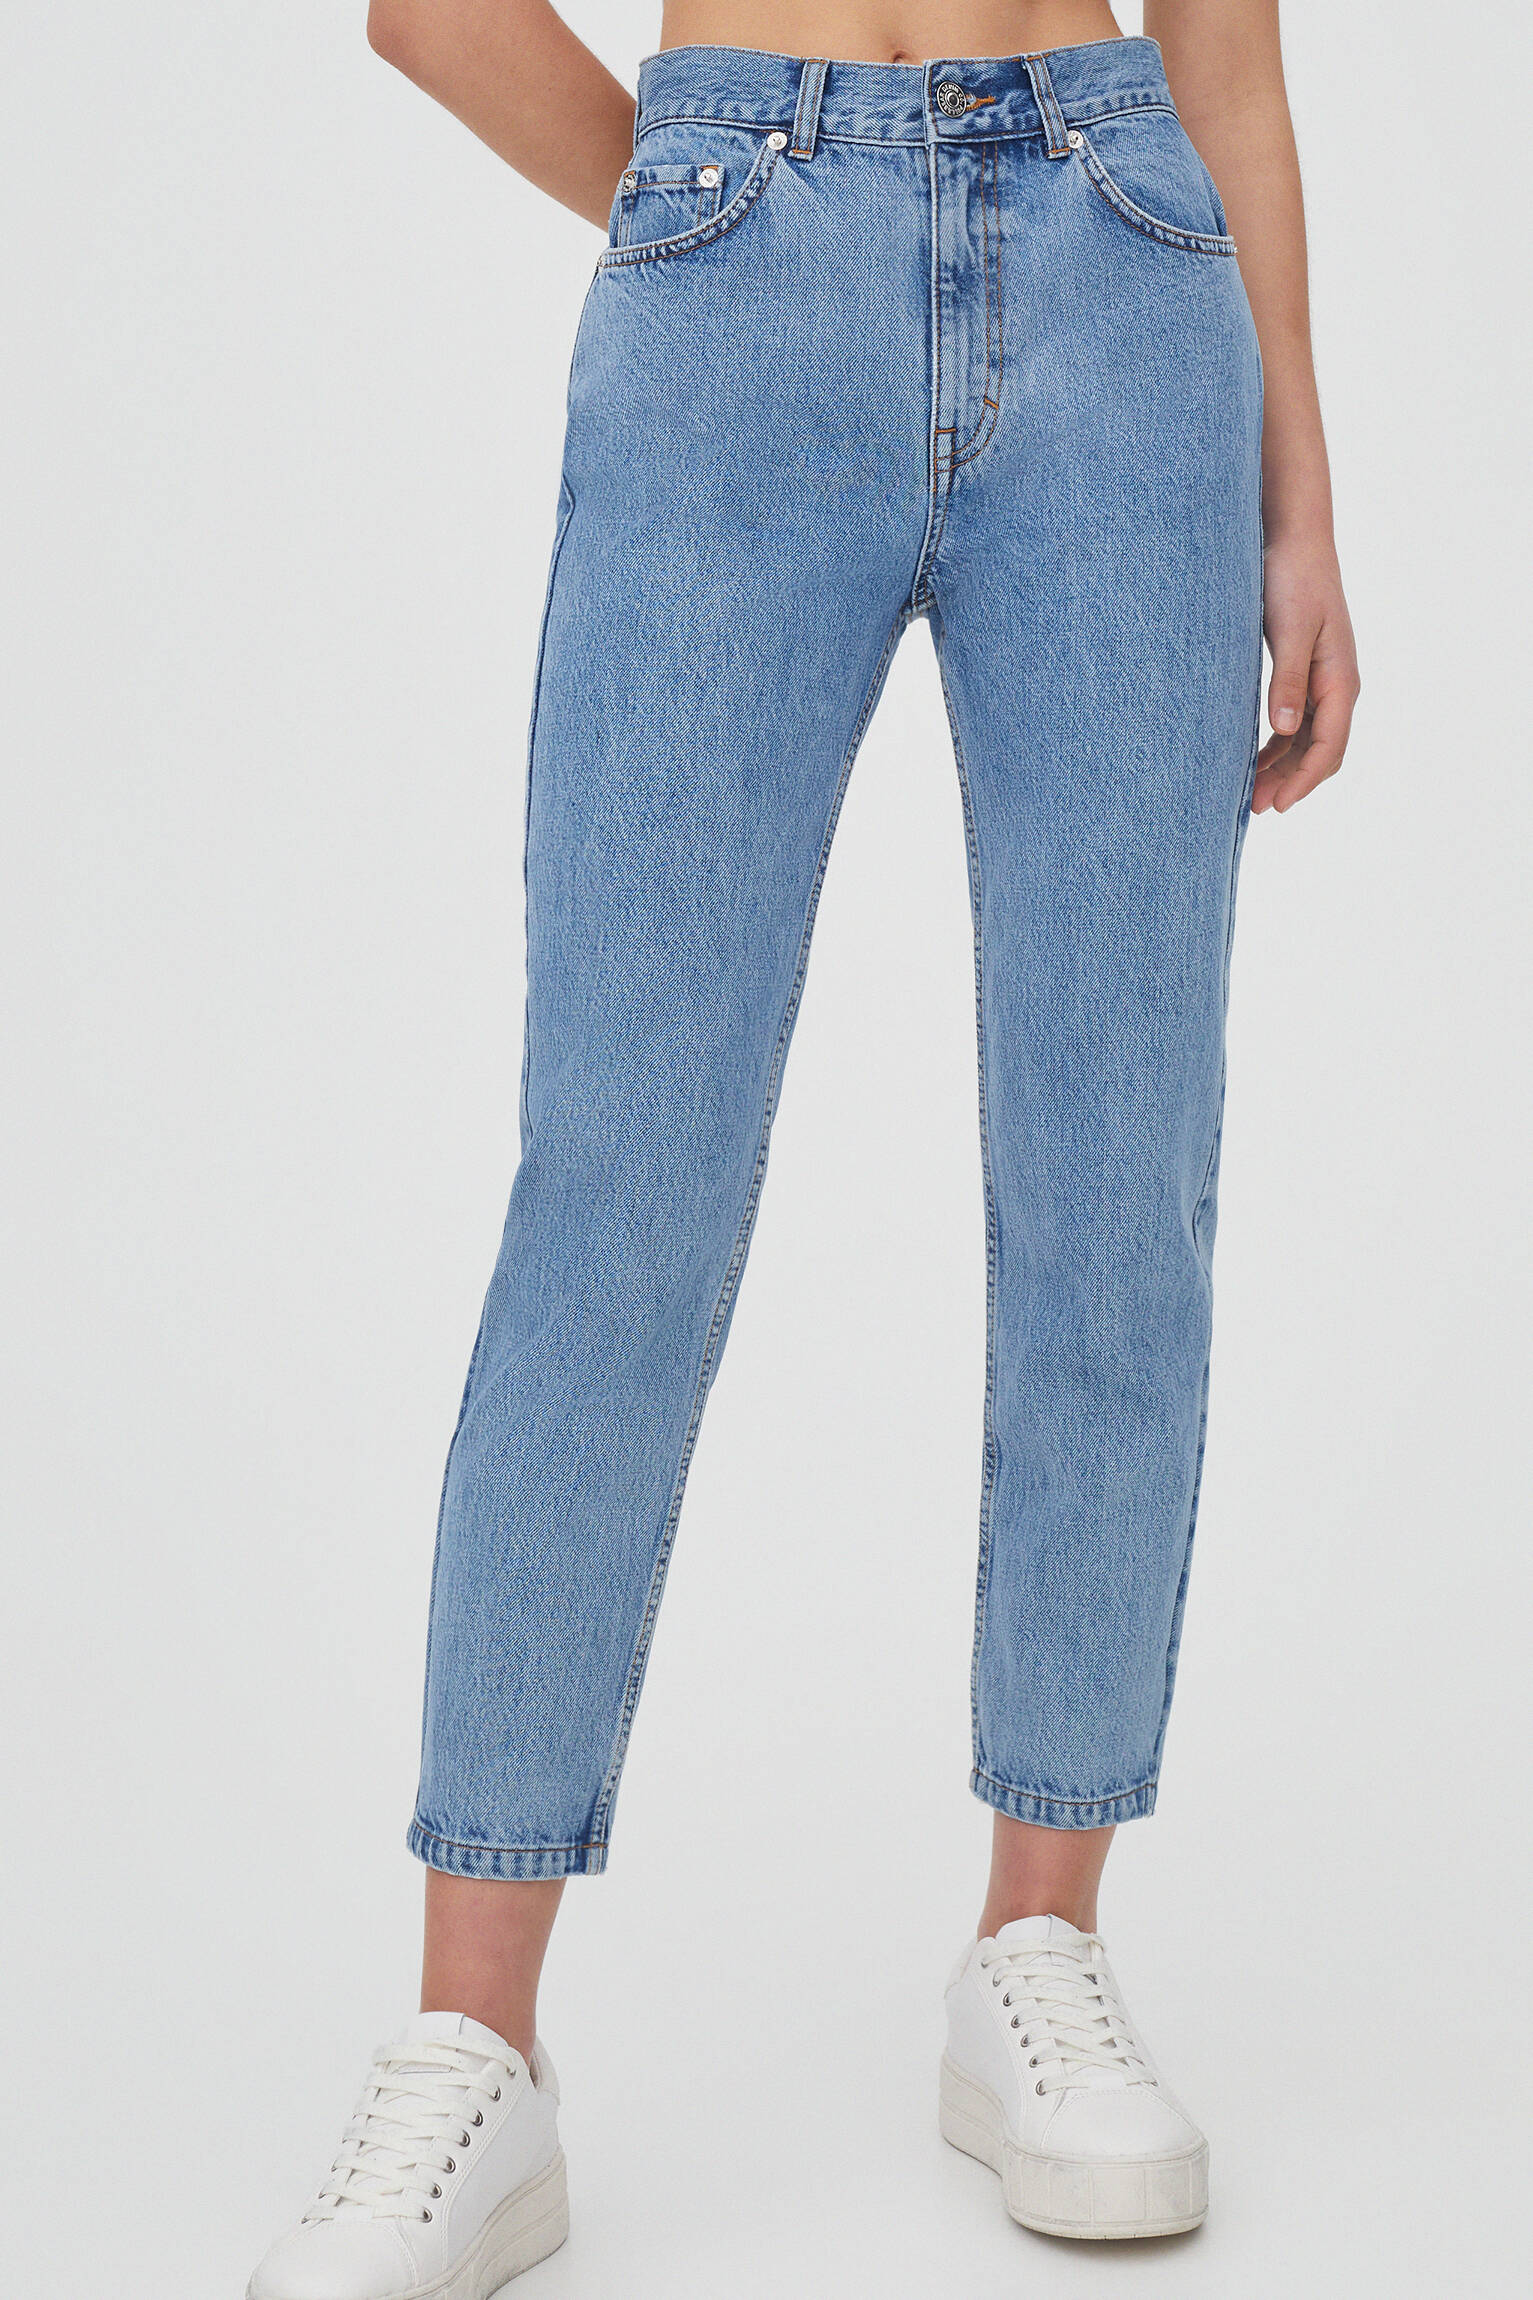 Базовые джинсы mom fit ВЫЦВЕТШИЙ СИНИЙ Pull & Bear